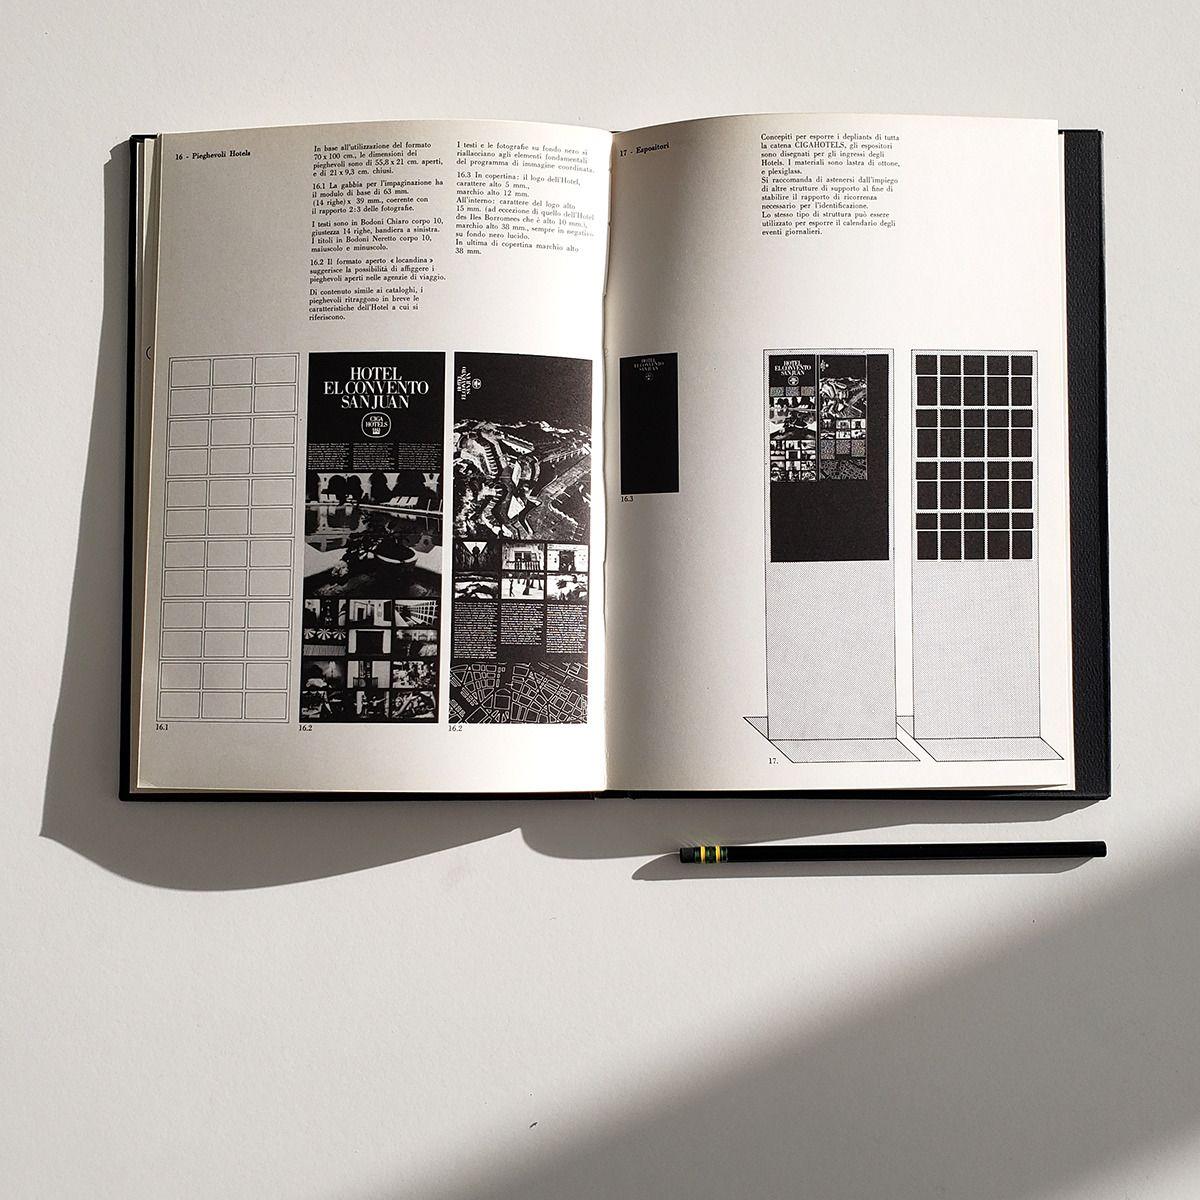 Calendario De 1978.It S Manuals Monday Today S Manual By Vignelli Associates